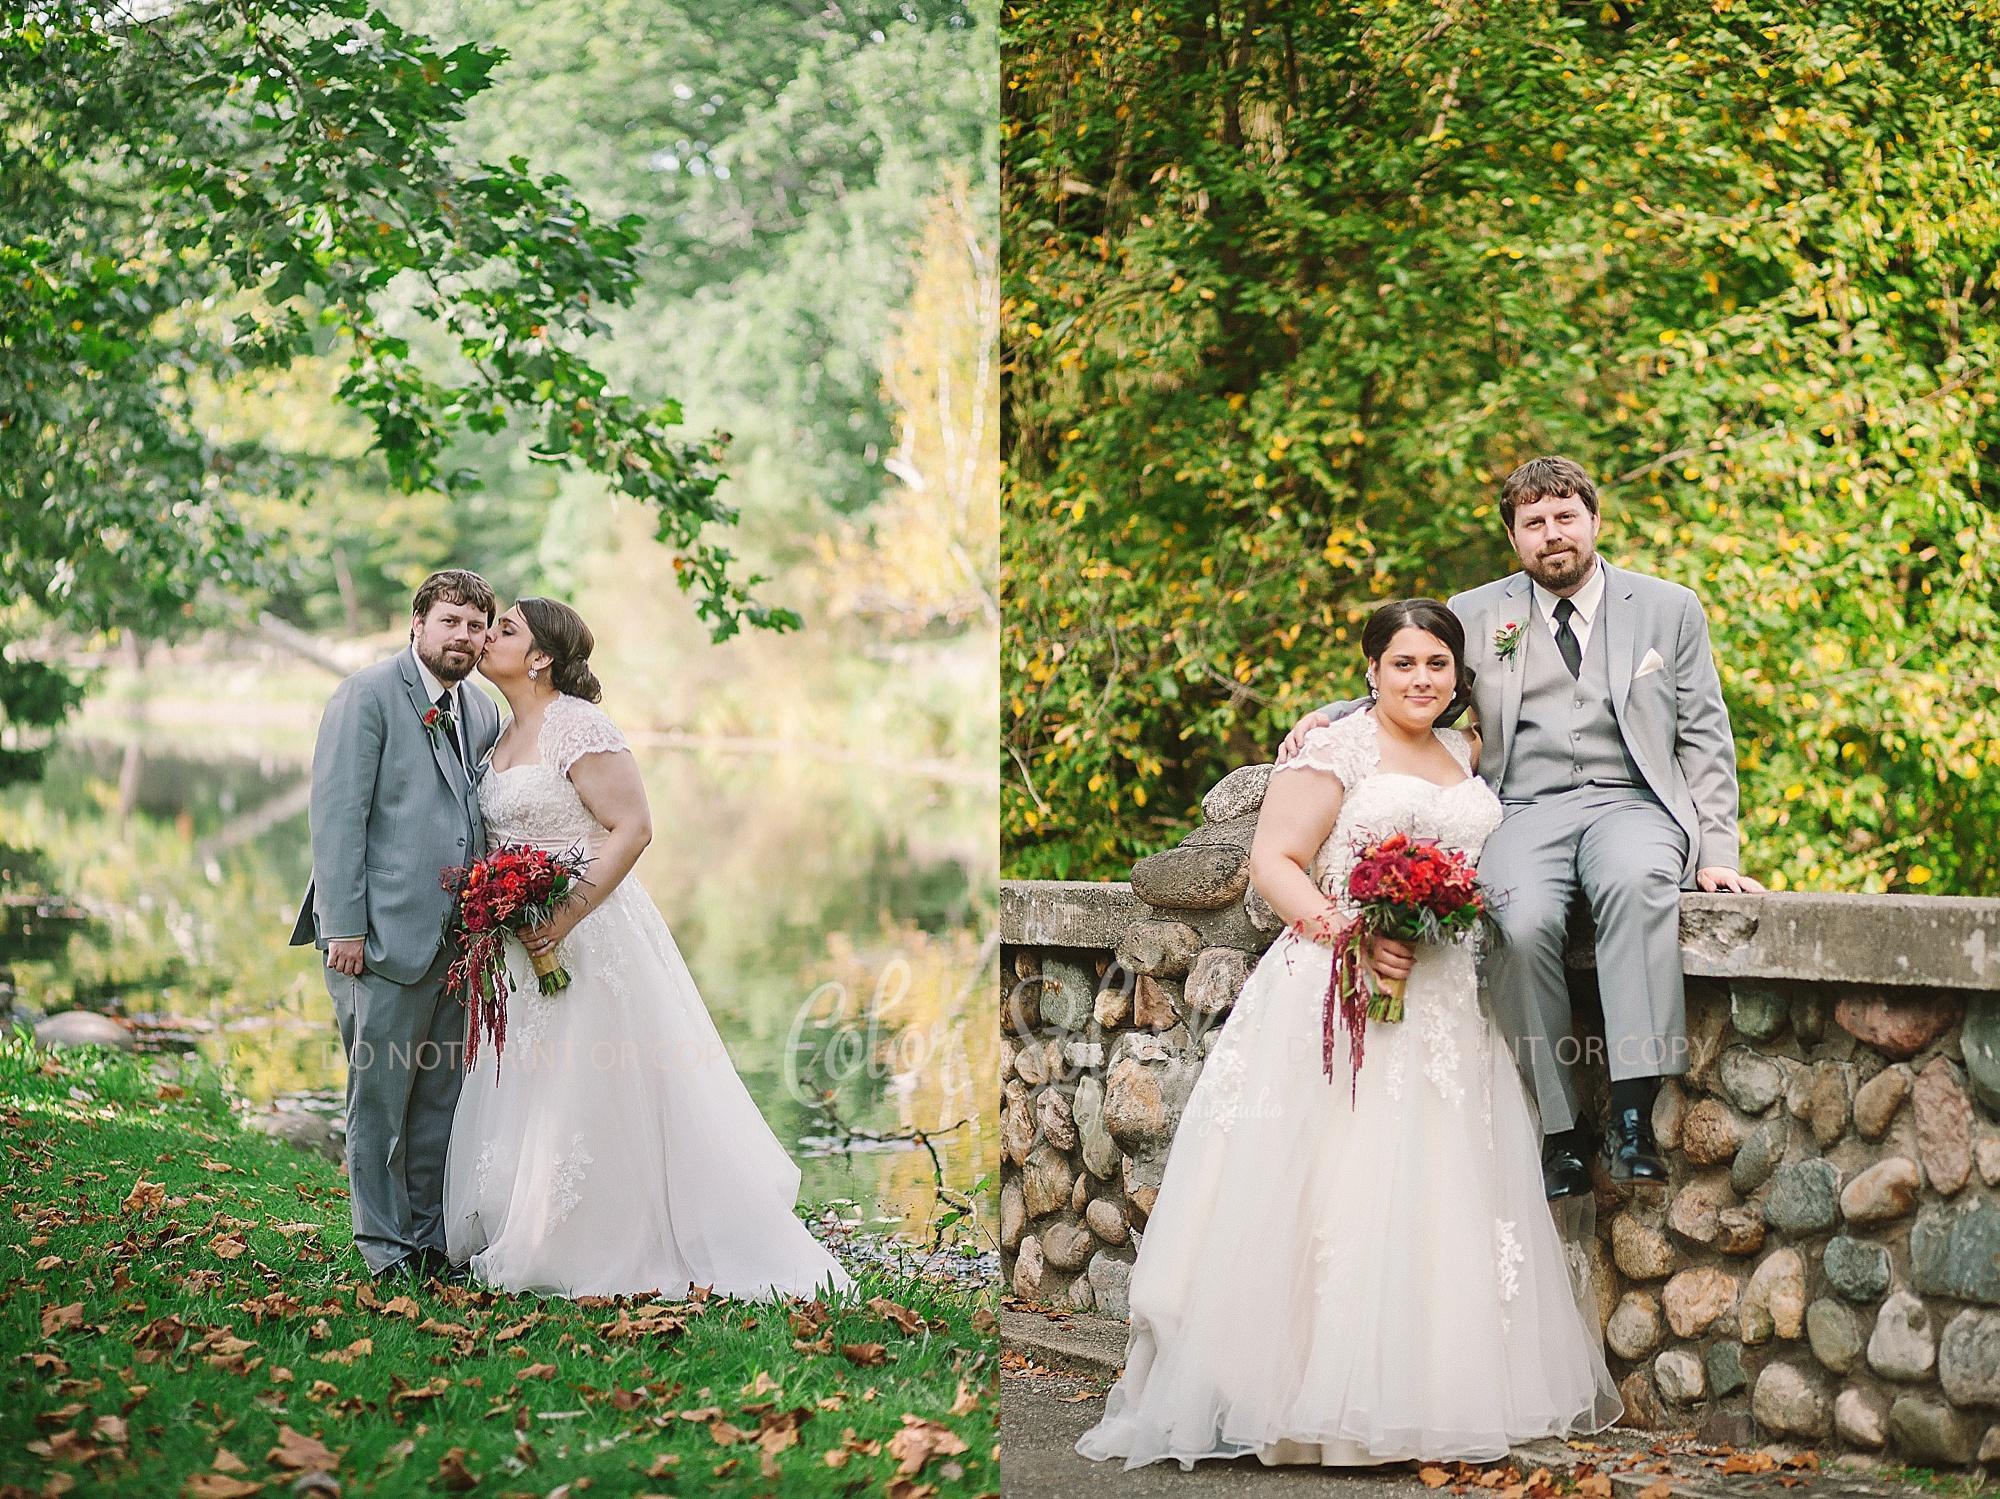 stetston-chapel-cityscapes-wedding-kalamazoo_0310